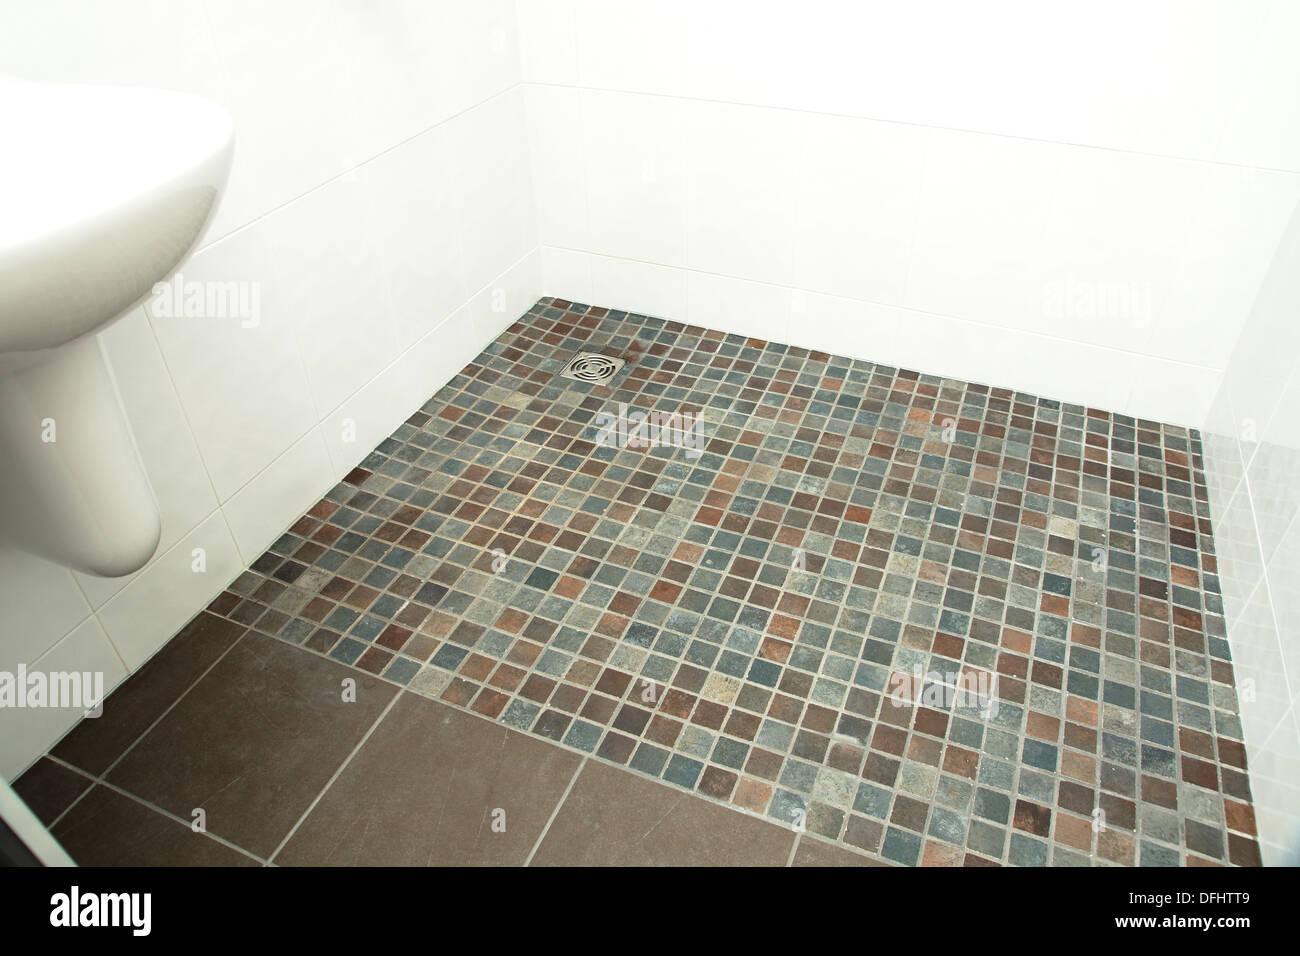 A speziell angepasste Nasszelle Dusche / Bad mit Anti-Rutsch-Fliesen ...